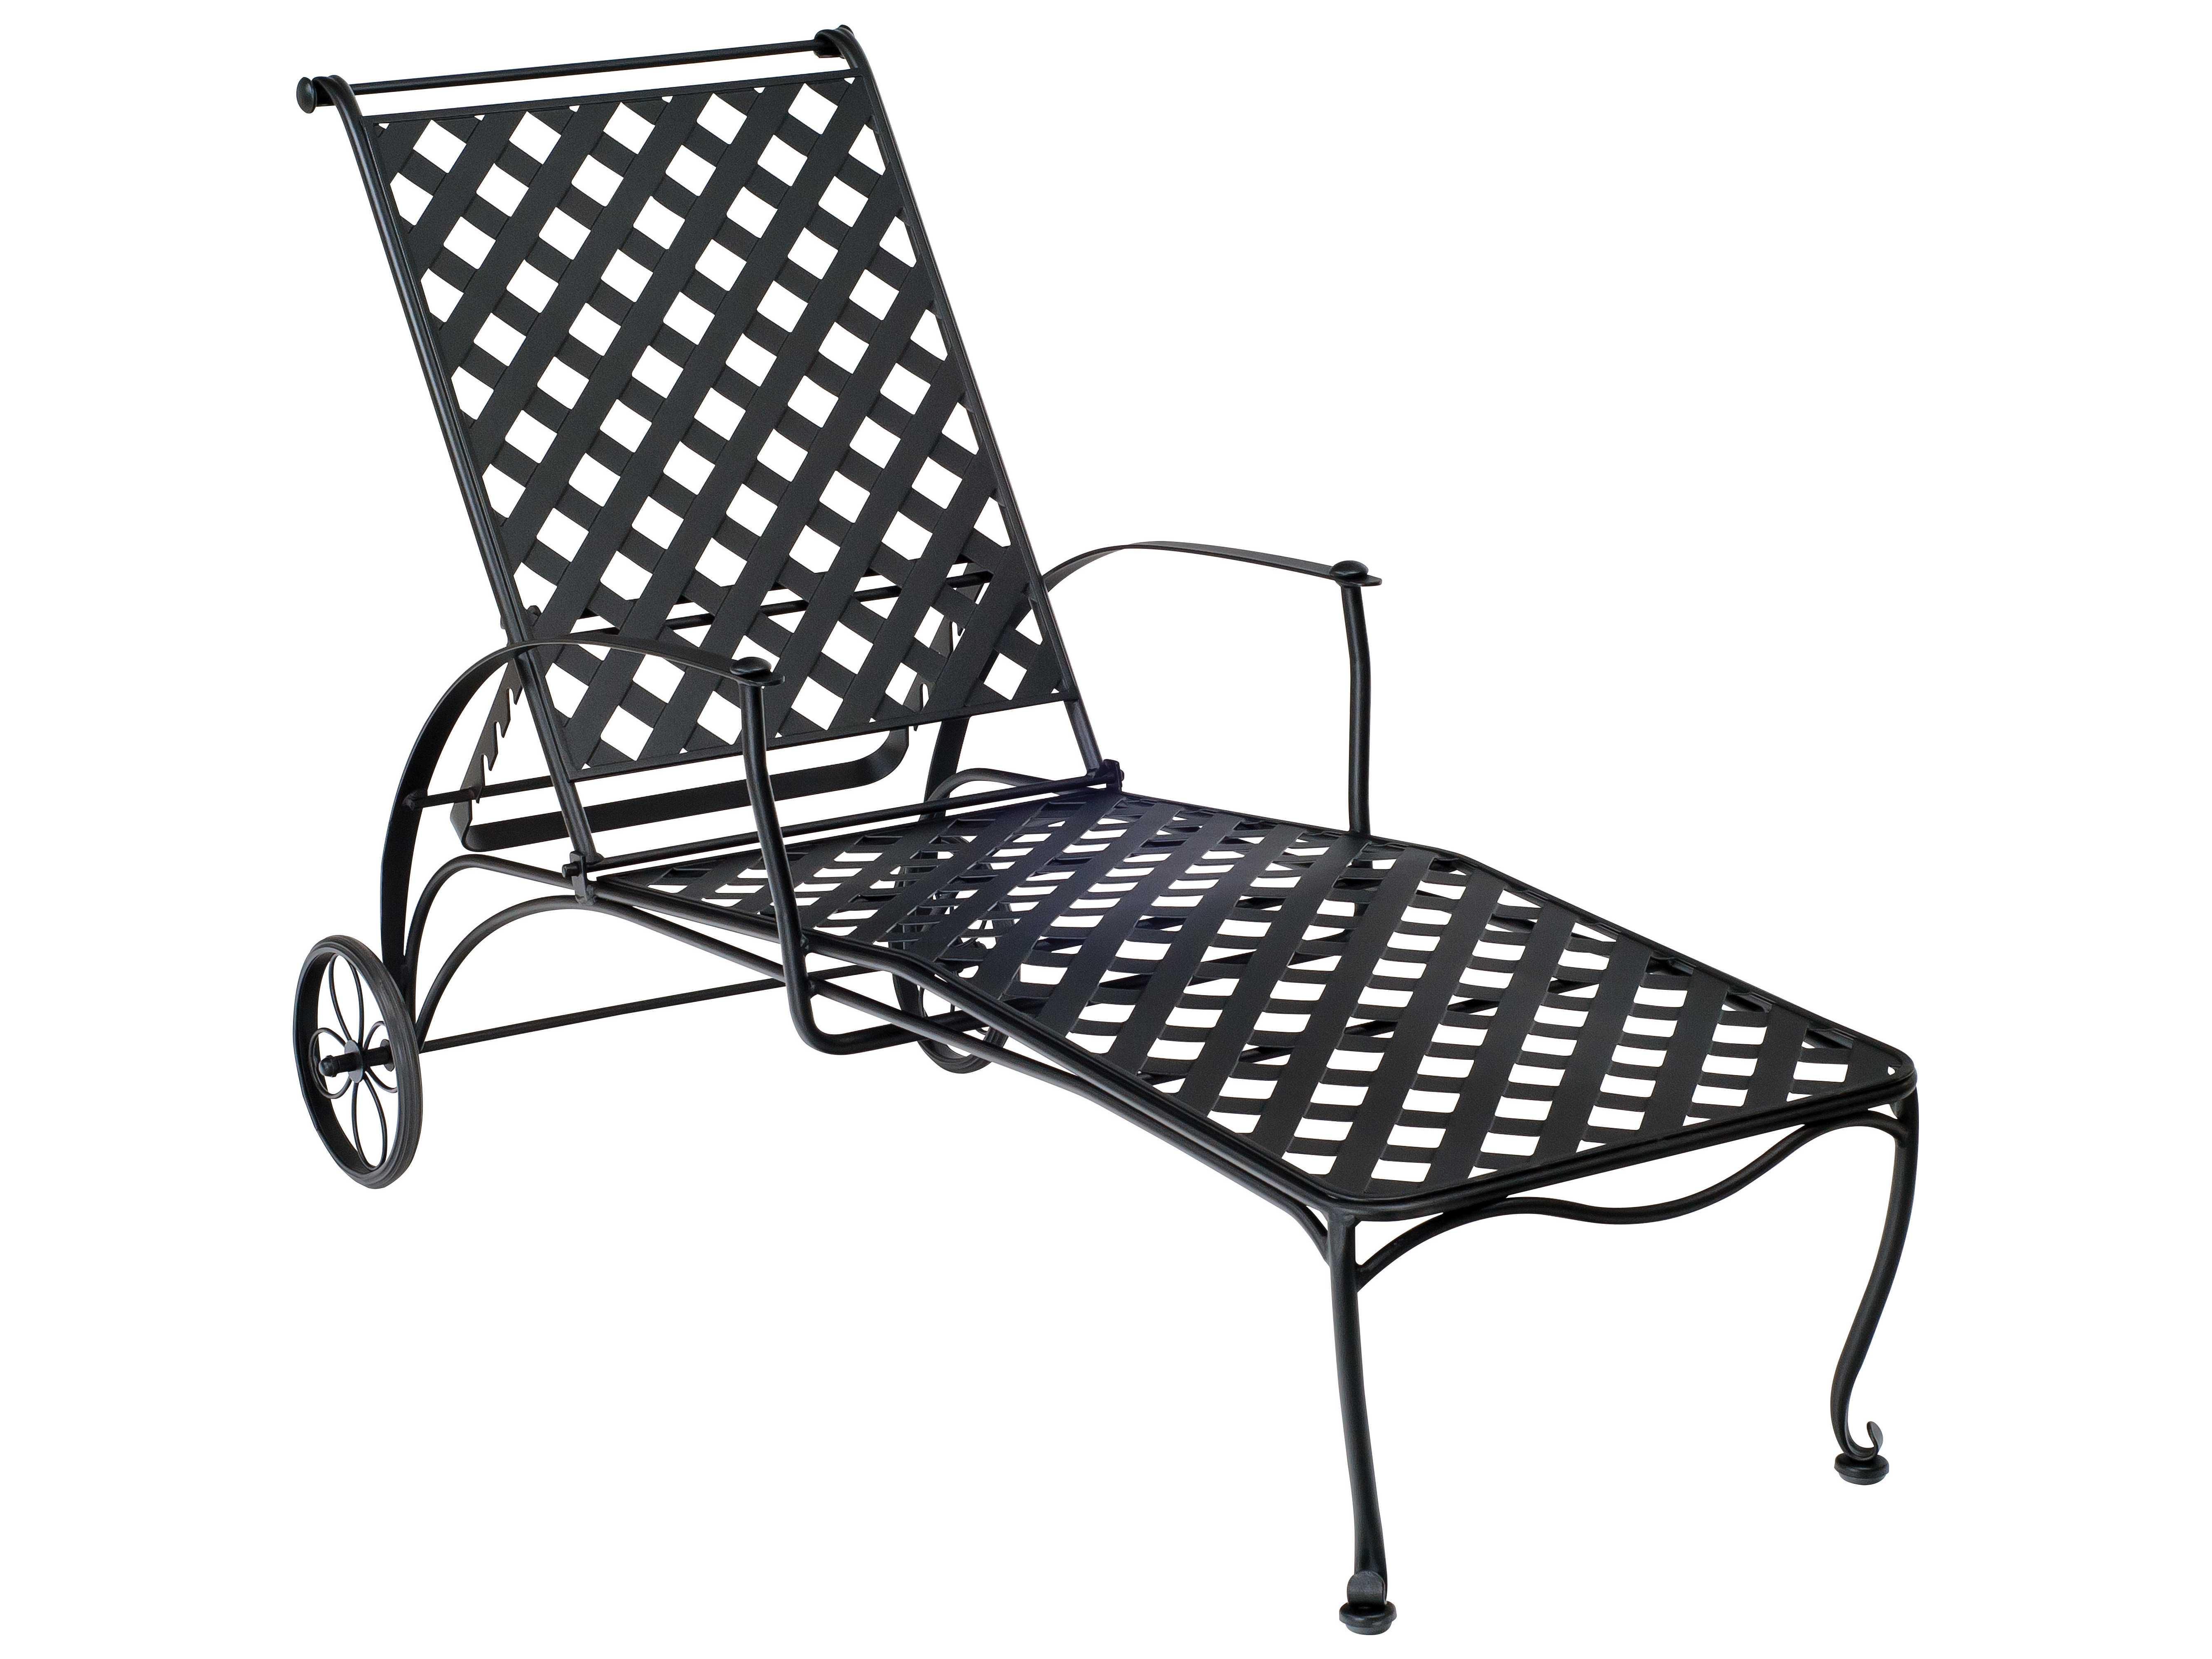 Woodard Maddox Wrought Iron Adjustable Chaise Lounge | 7F0070